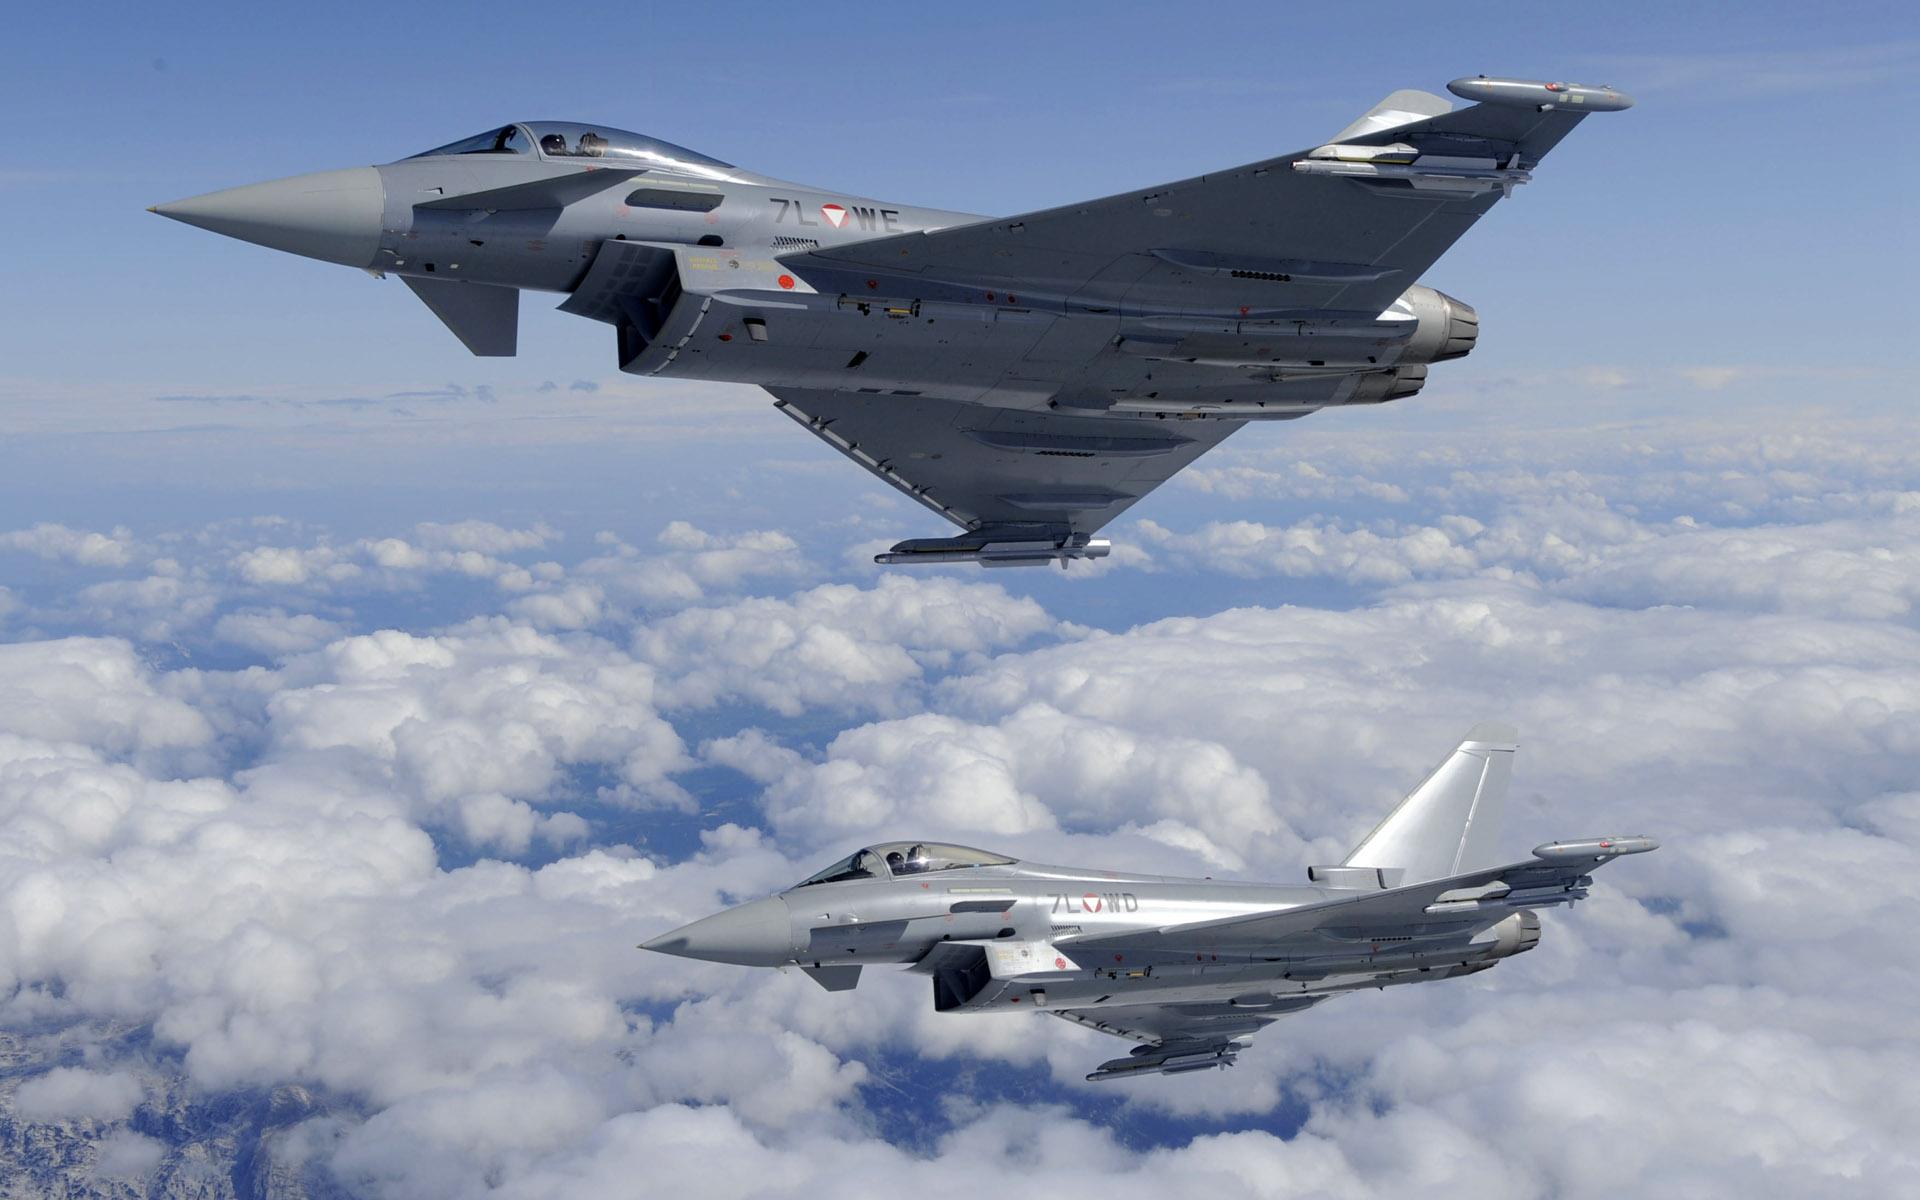 Обои самолеты, Eurofighter typhoon. Авиация foto 9